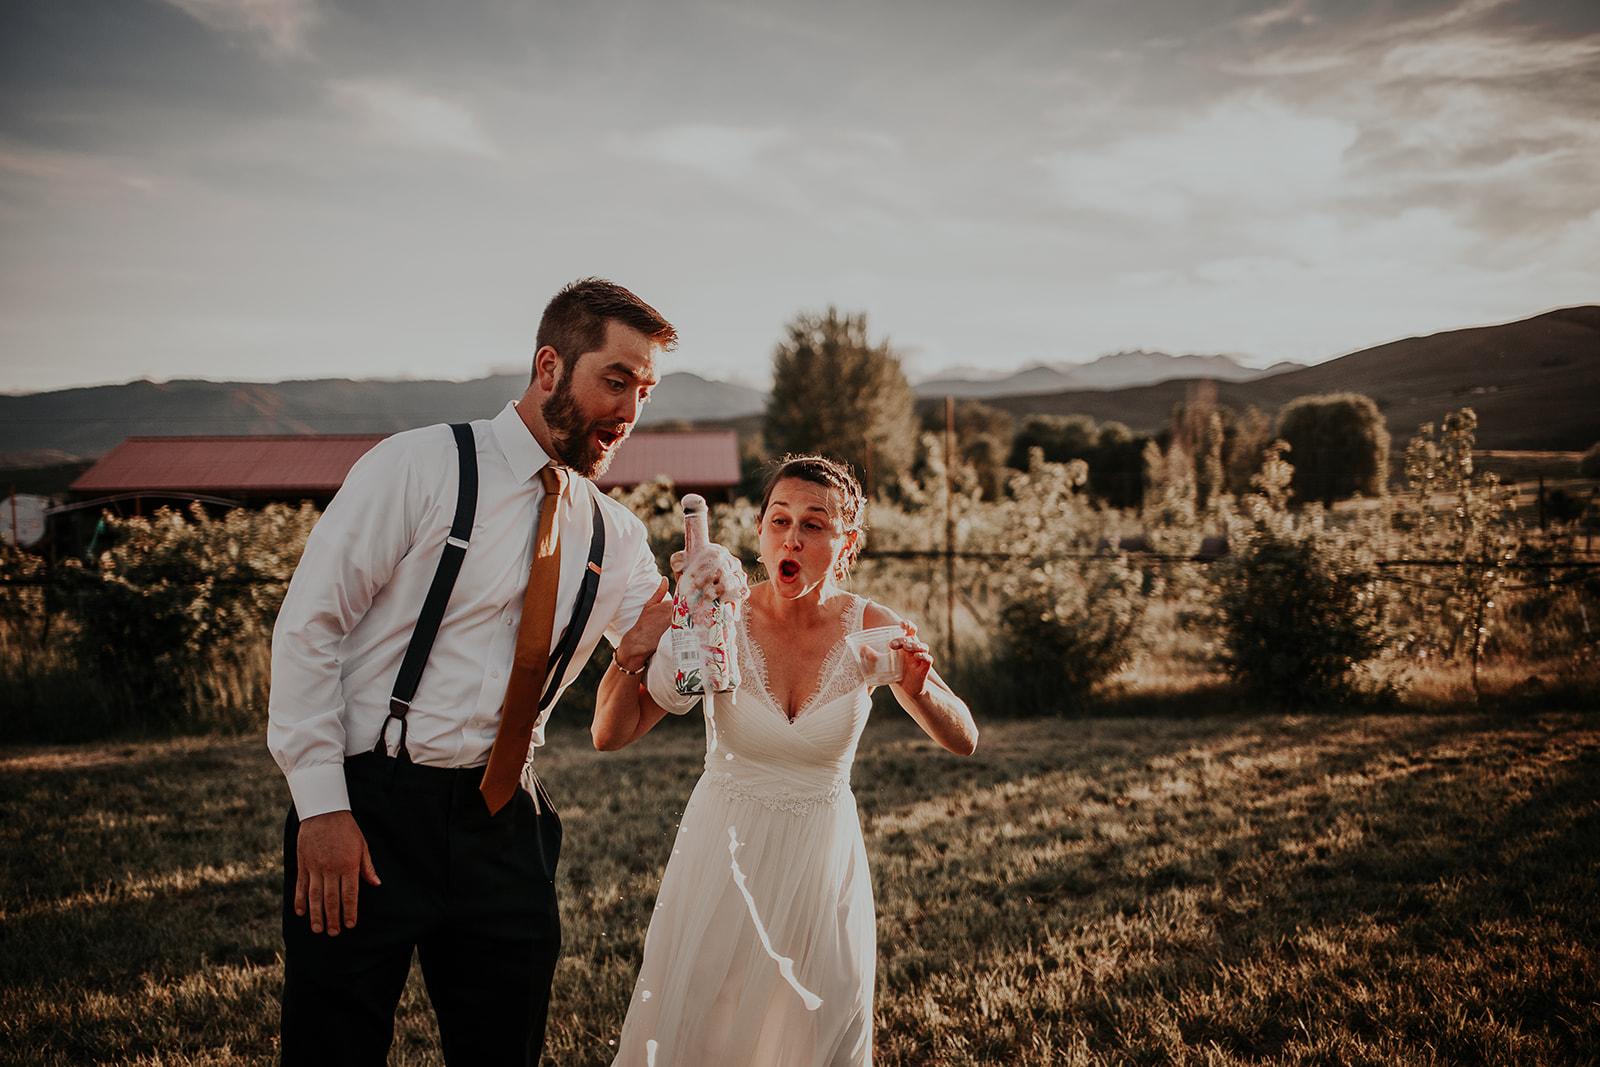 north-cascades-elopement-wedding-winthrop-wedding-photographer-megan-gallagher-photography (35).jpg